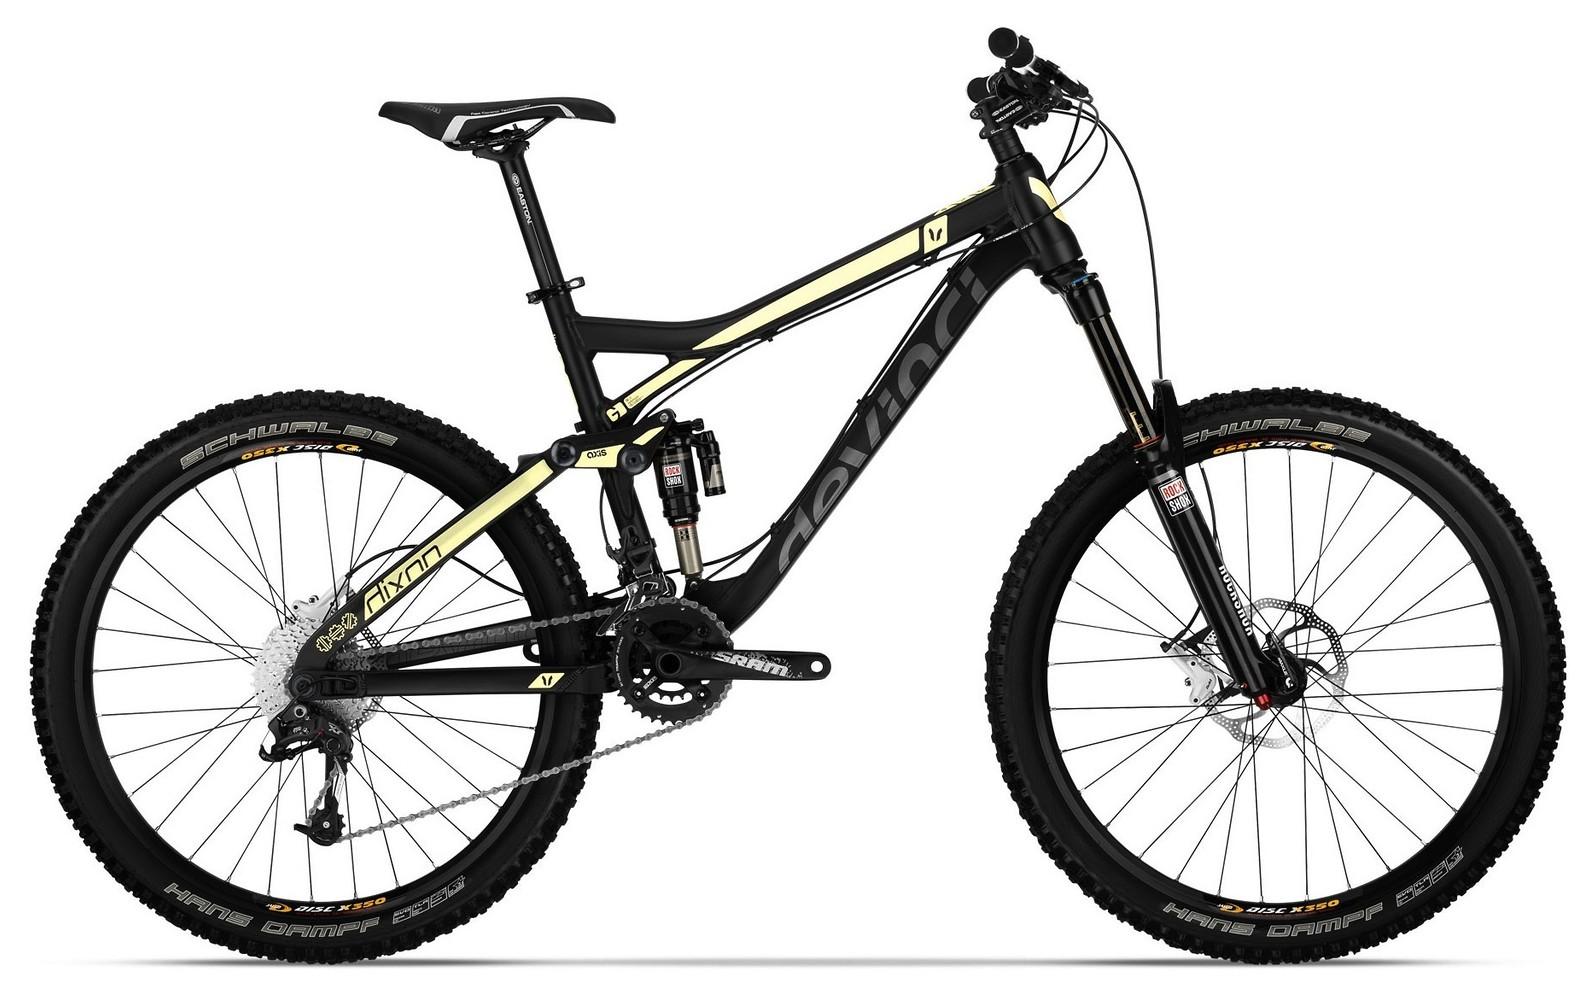 Bike - 2014 Devinci Dixon RS